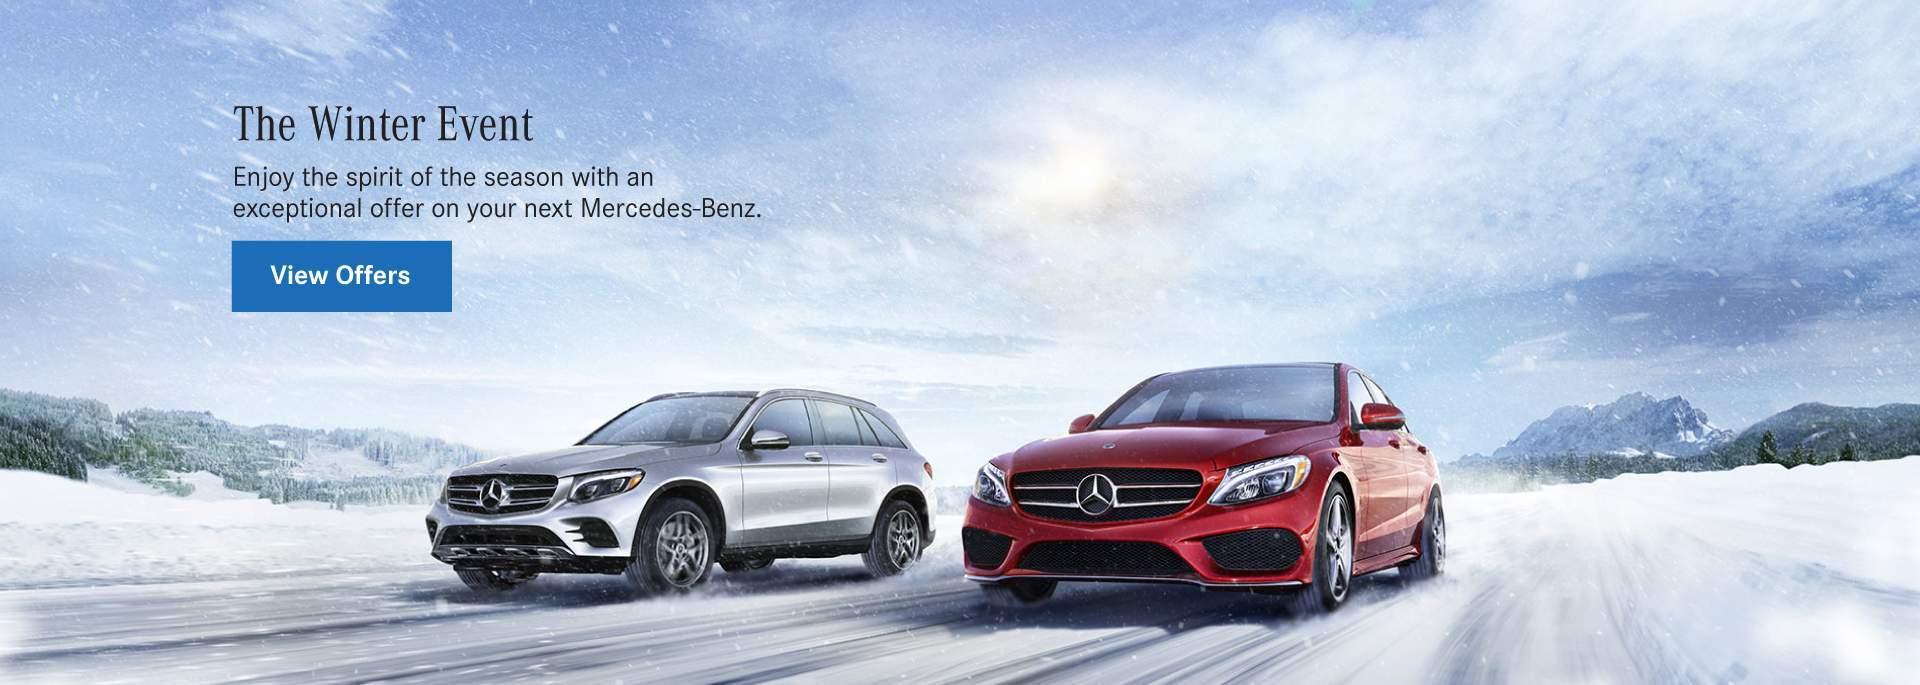 Mercedes benz dealership seattle wa used cars mercedes for Mercedes benz of lynwood